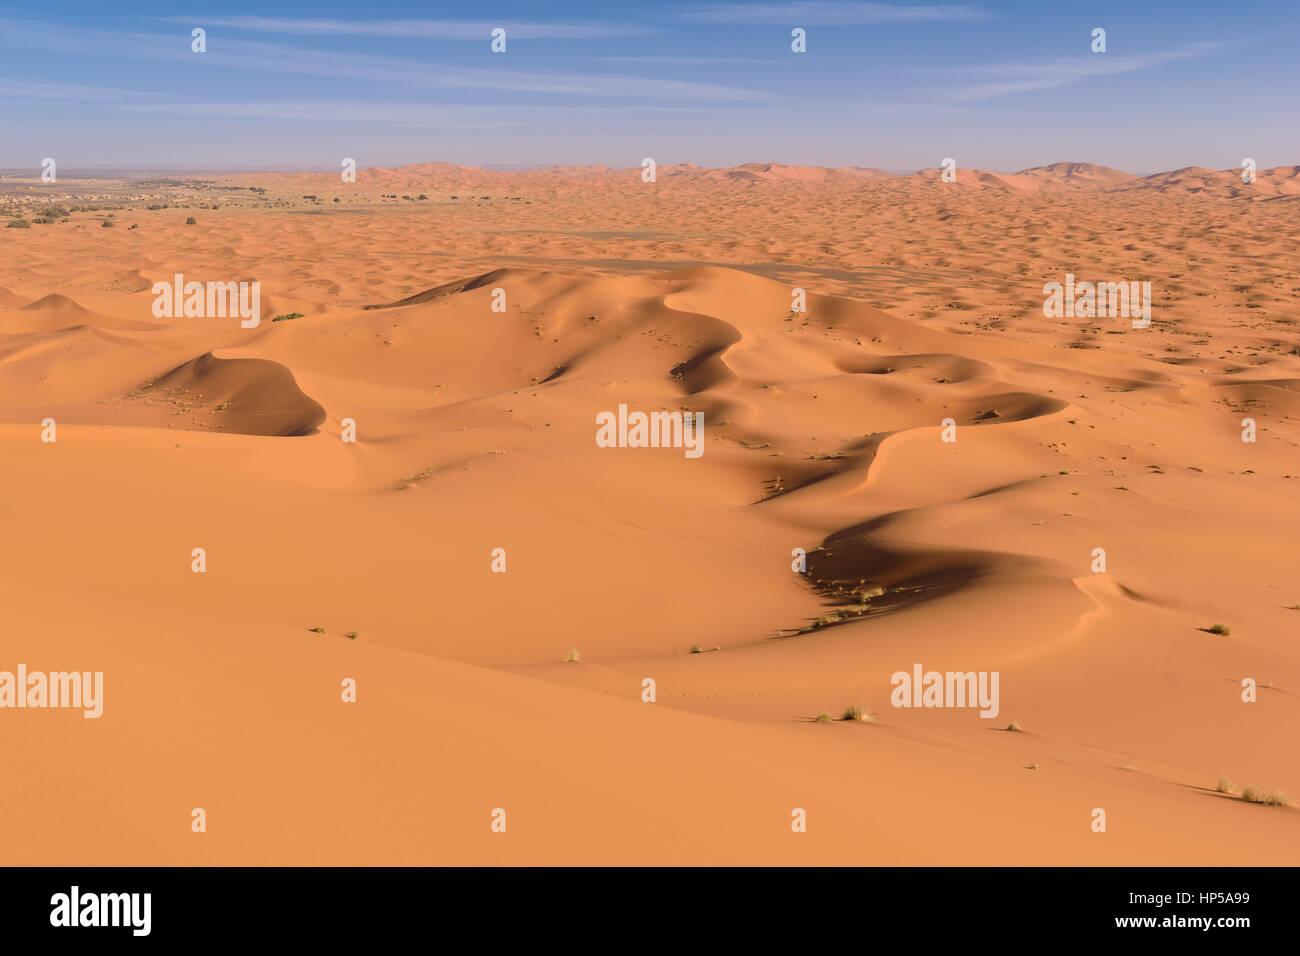 Sahara Erg Chebbi dunes, Merzouga, Morocco  - Stock Image